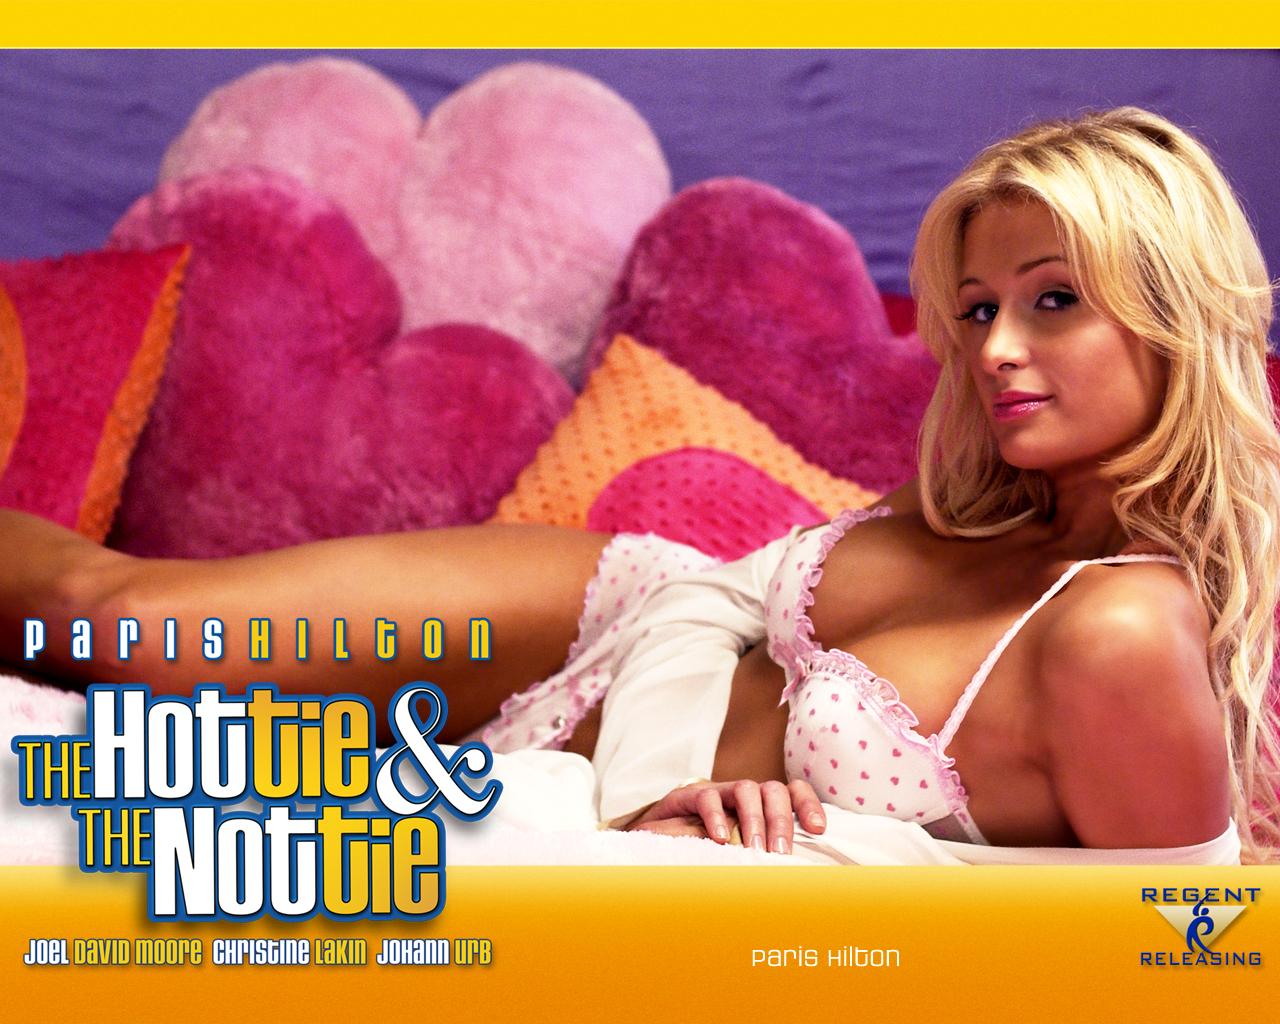 The Hottie And The Nottie 005 | Free Desktop Wallpapers ...